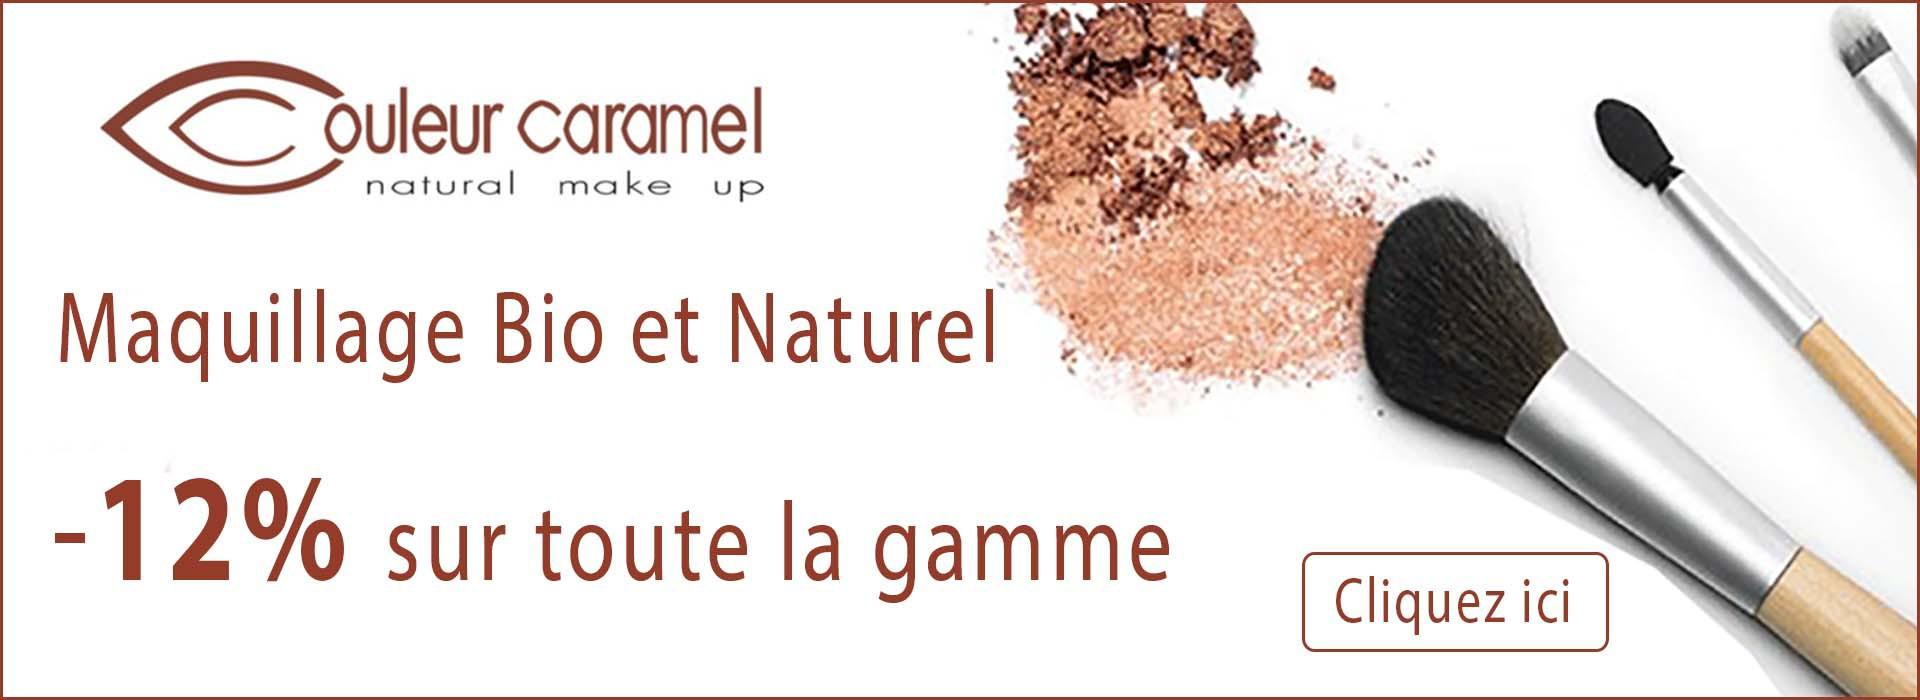 Maquillage Bio - Couleur Caramel -12%